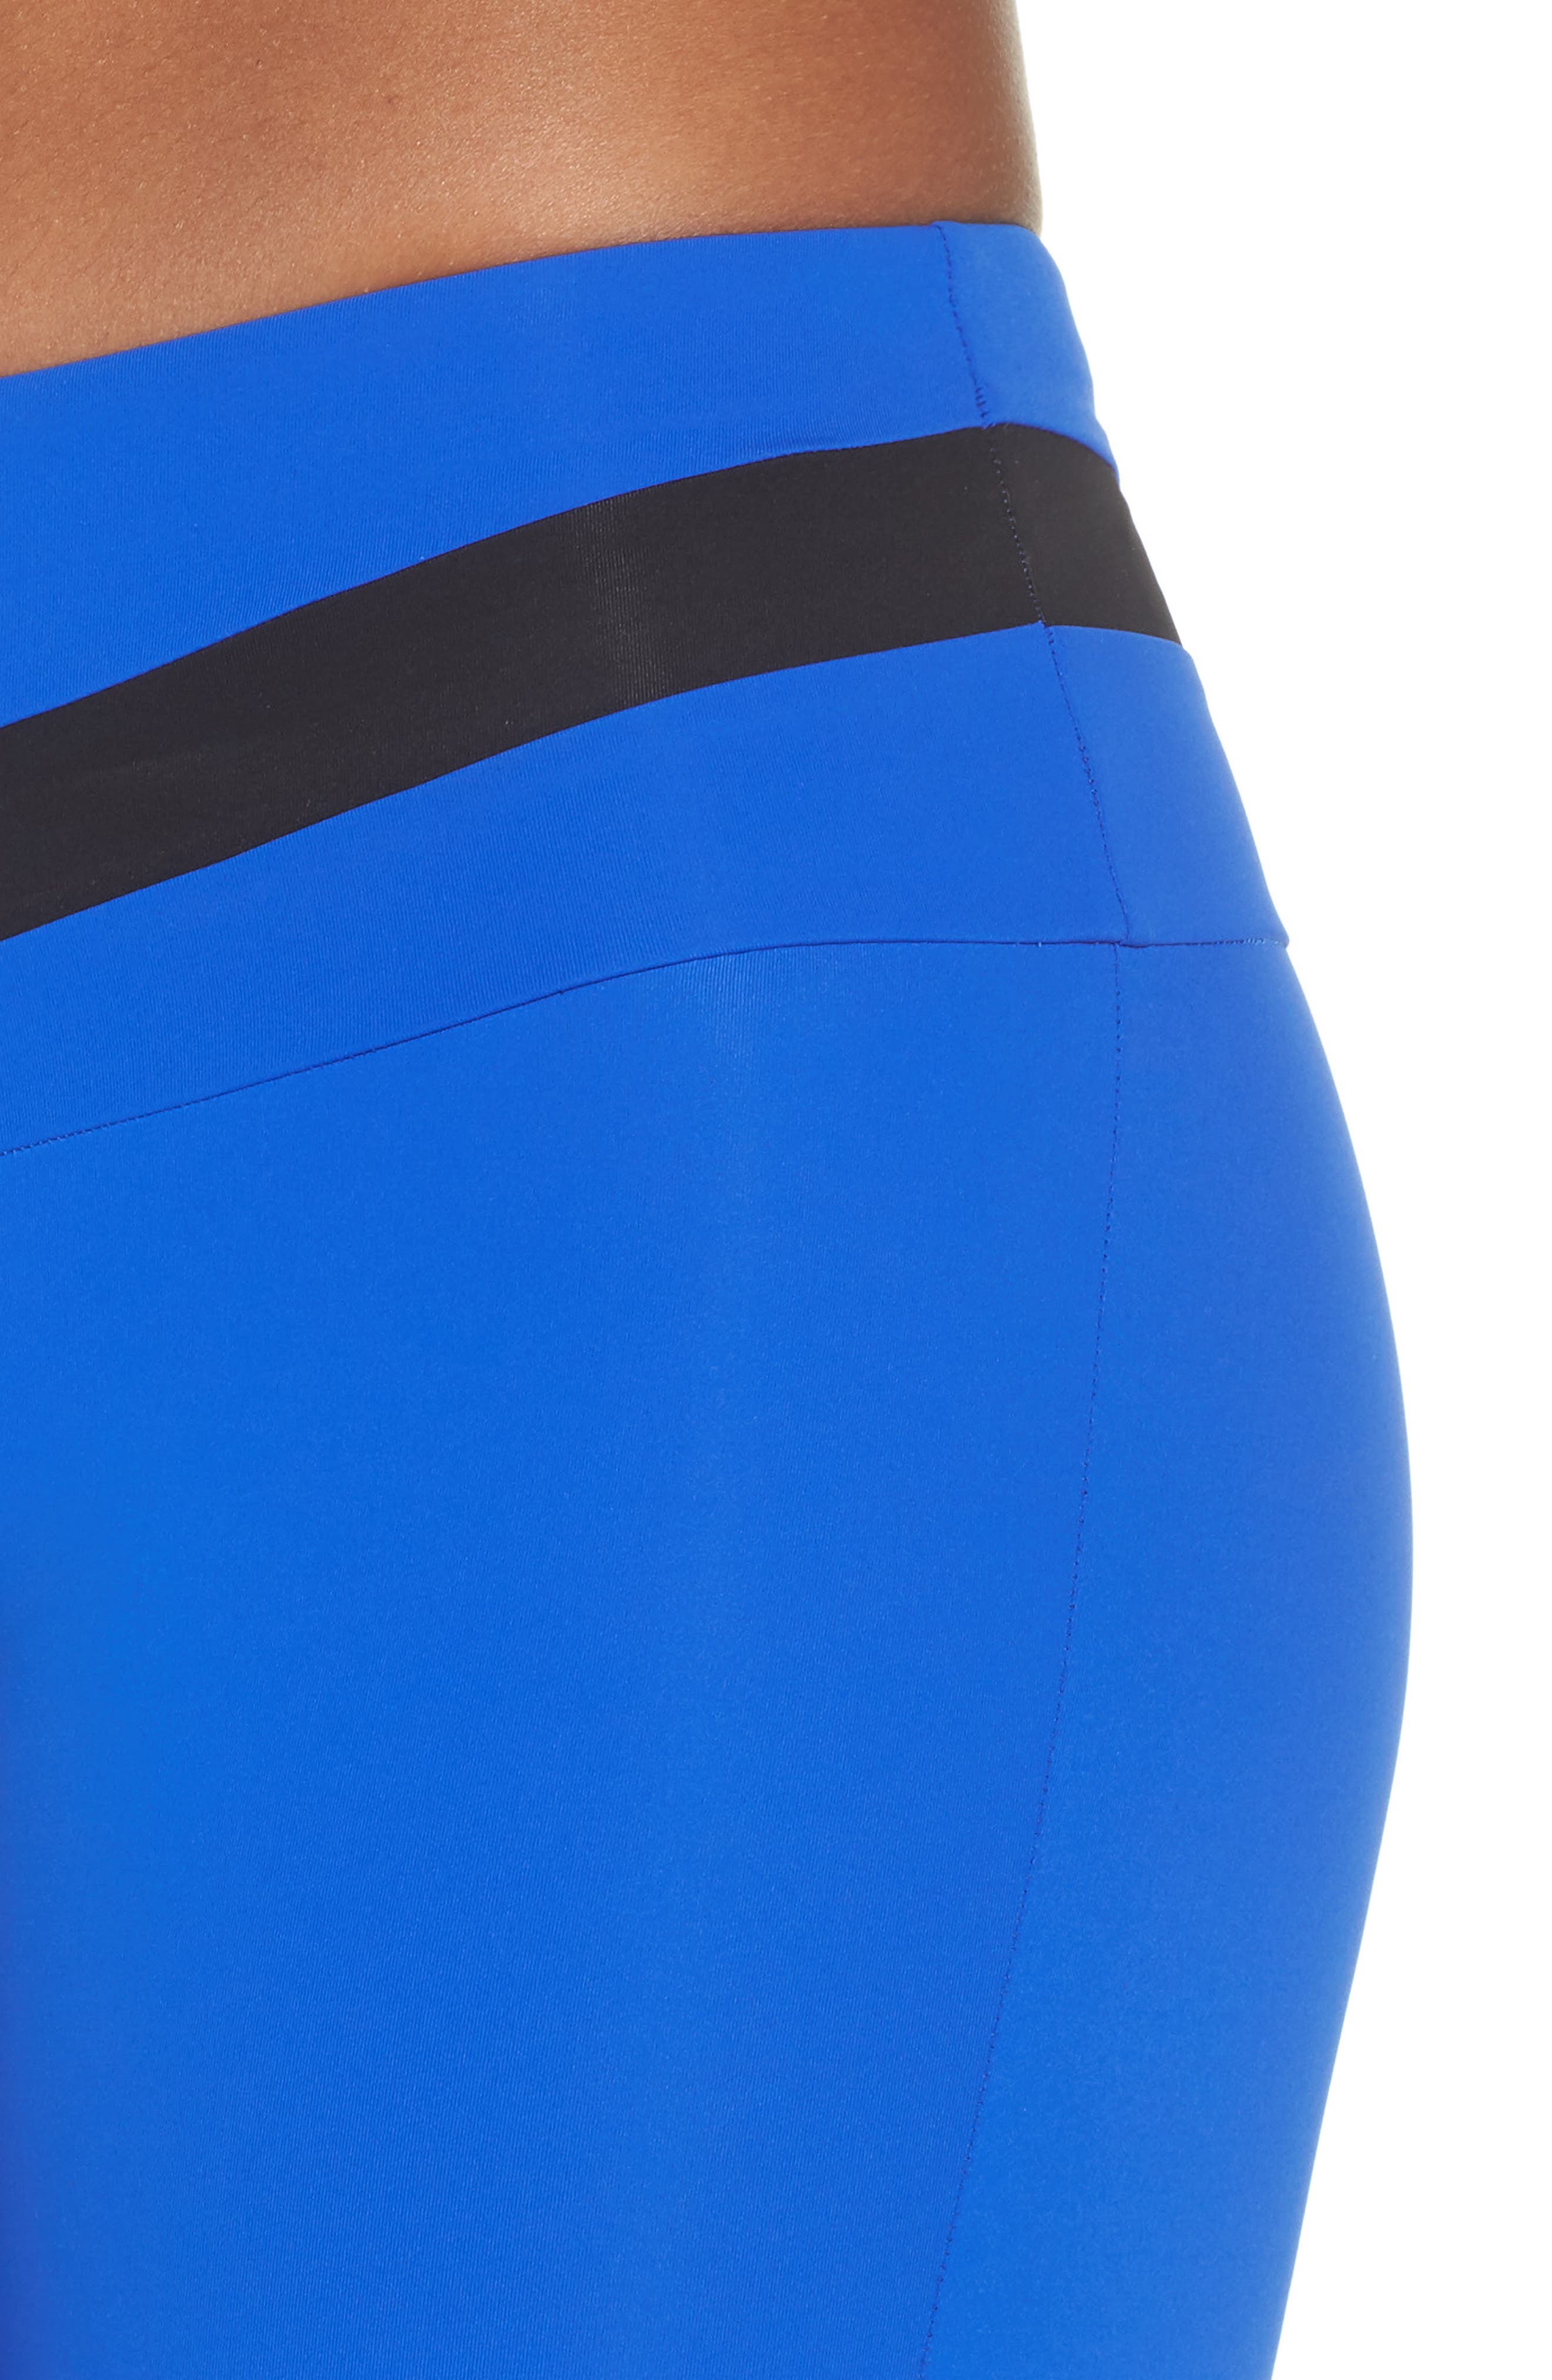 BoomBoom Athletica Tricolor Leggings,                             Alternate thumbnail 4, color,                             Cobalt Blue/ Black